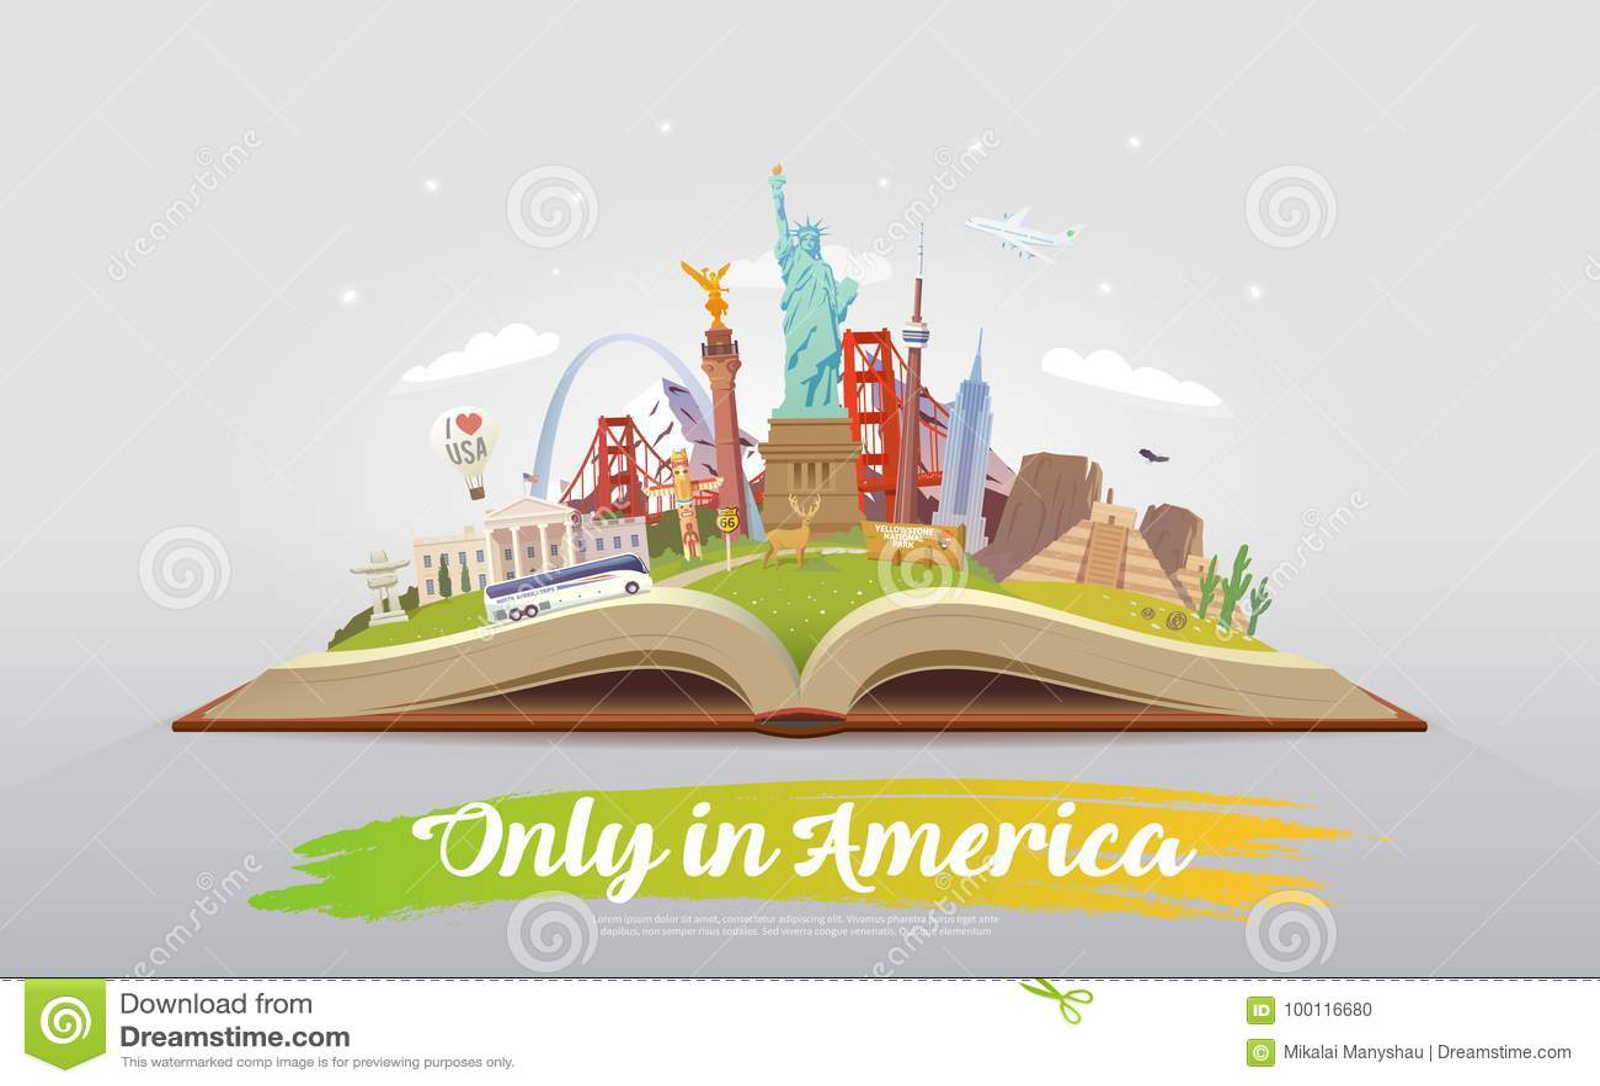 Top 200 Travel Books